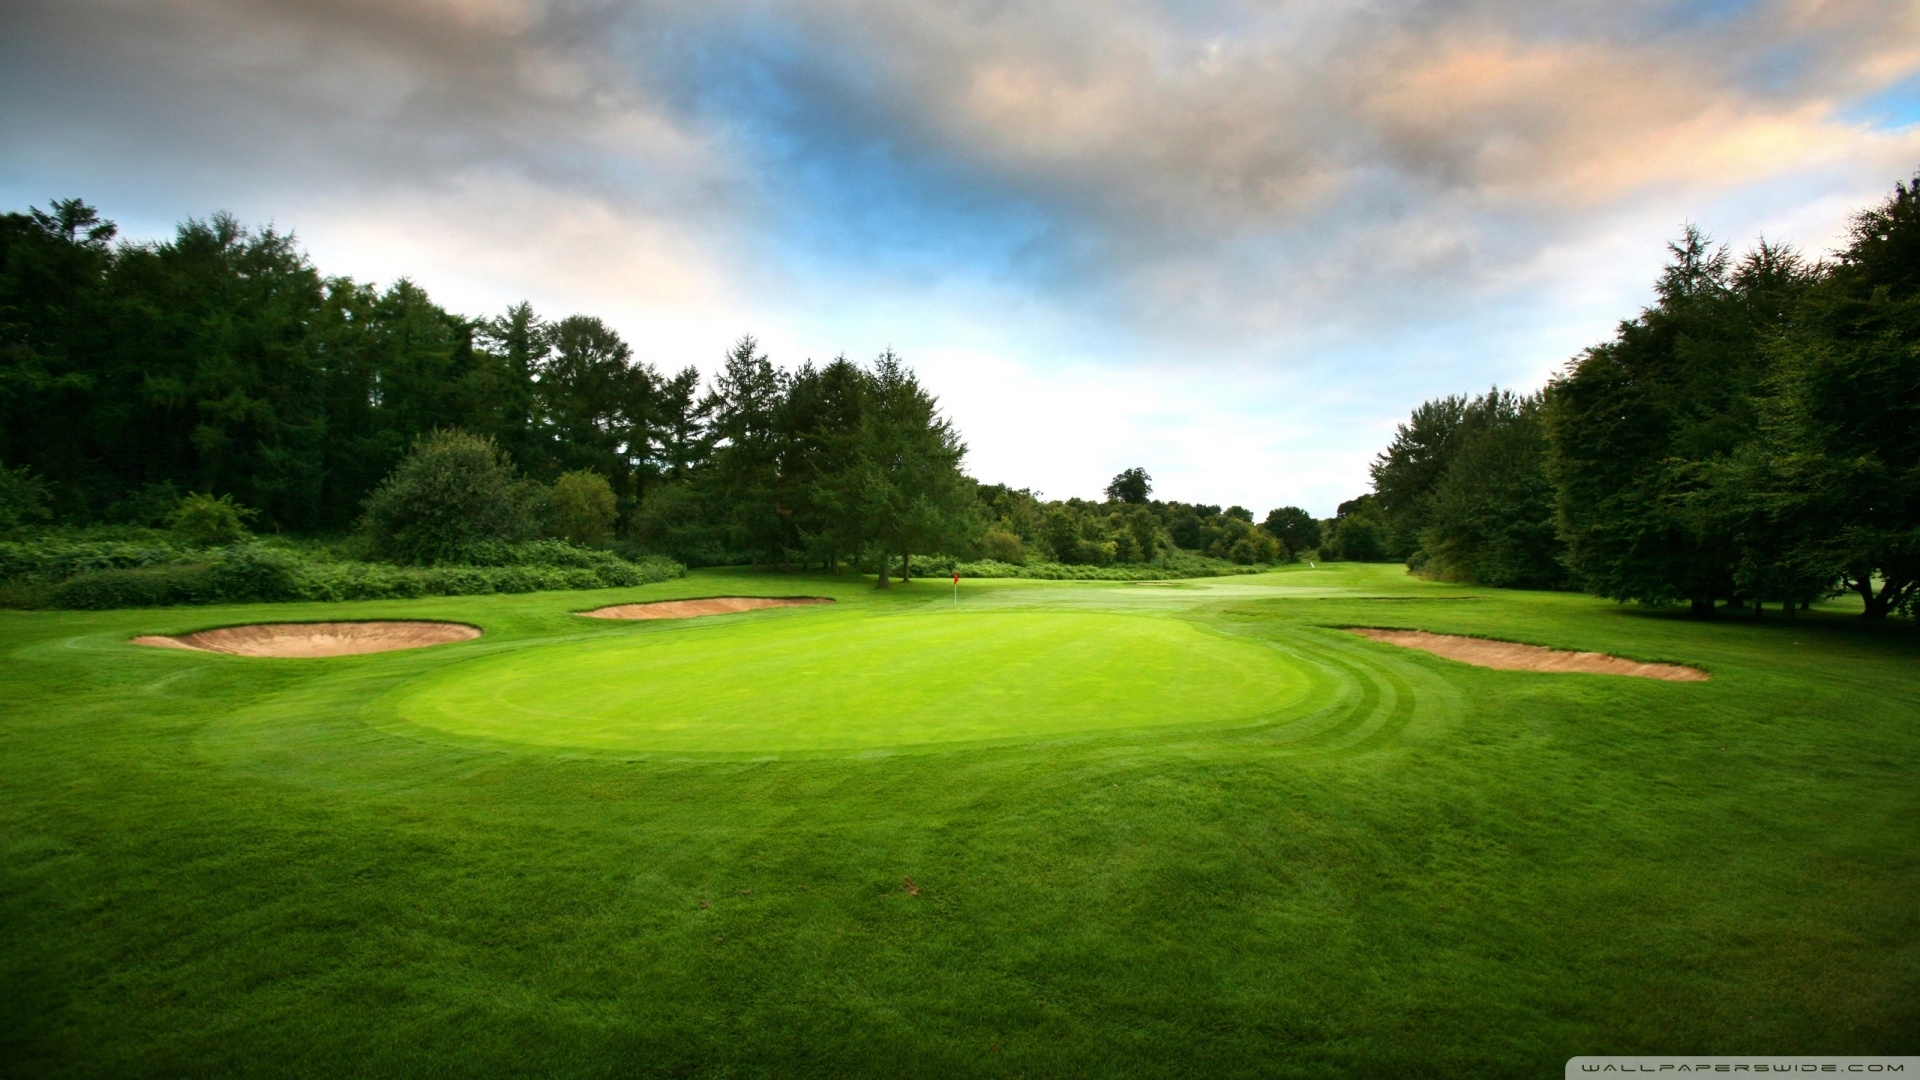 10 Best Golf Course Wallpaper 1920X1080 FULL HD 1080p For ...